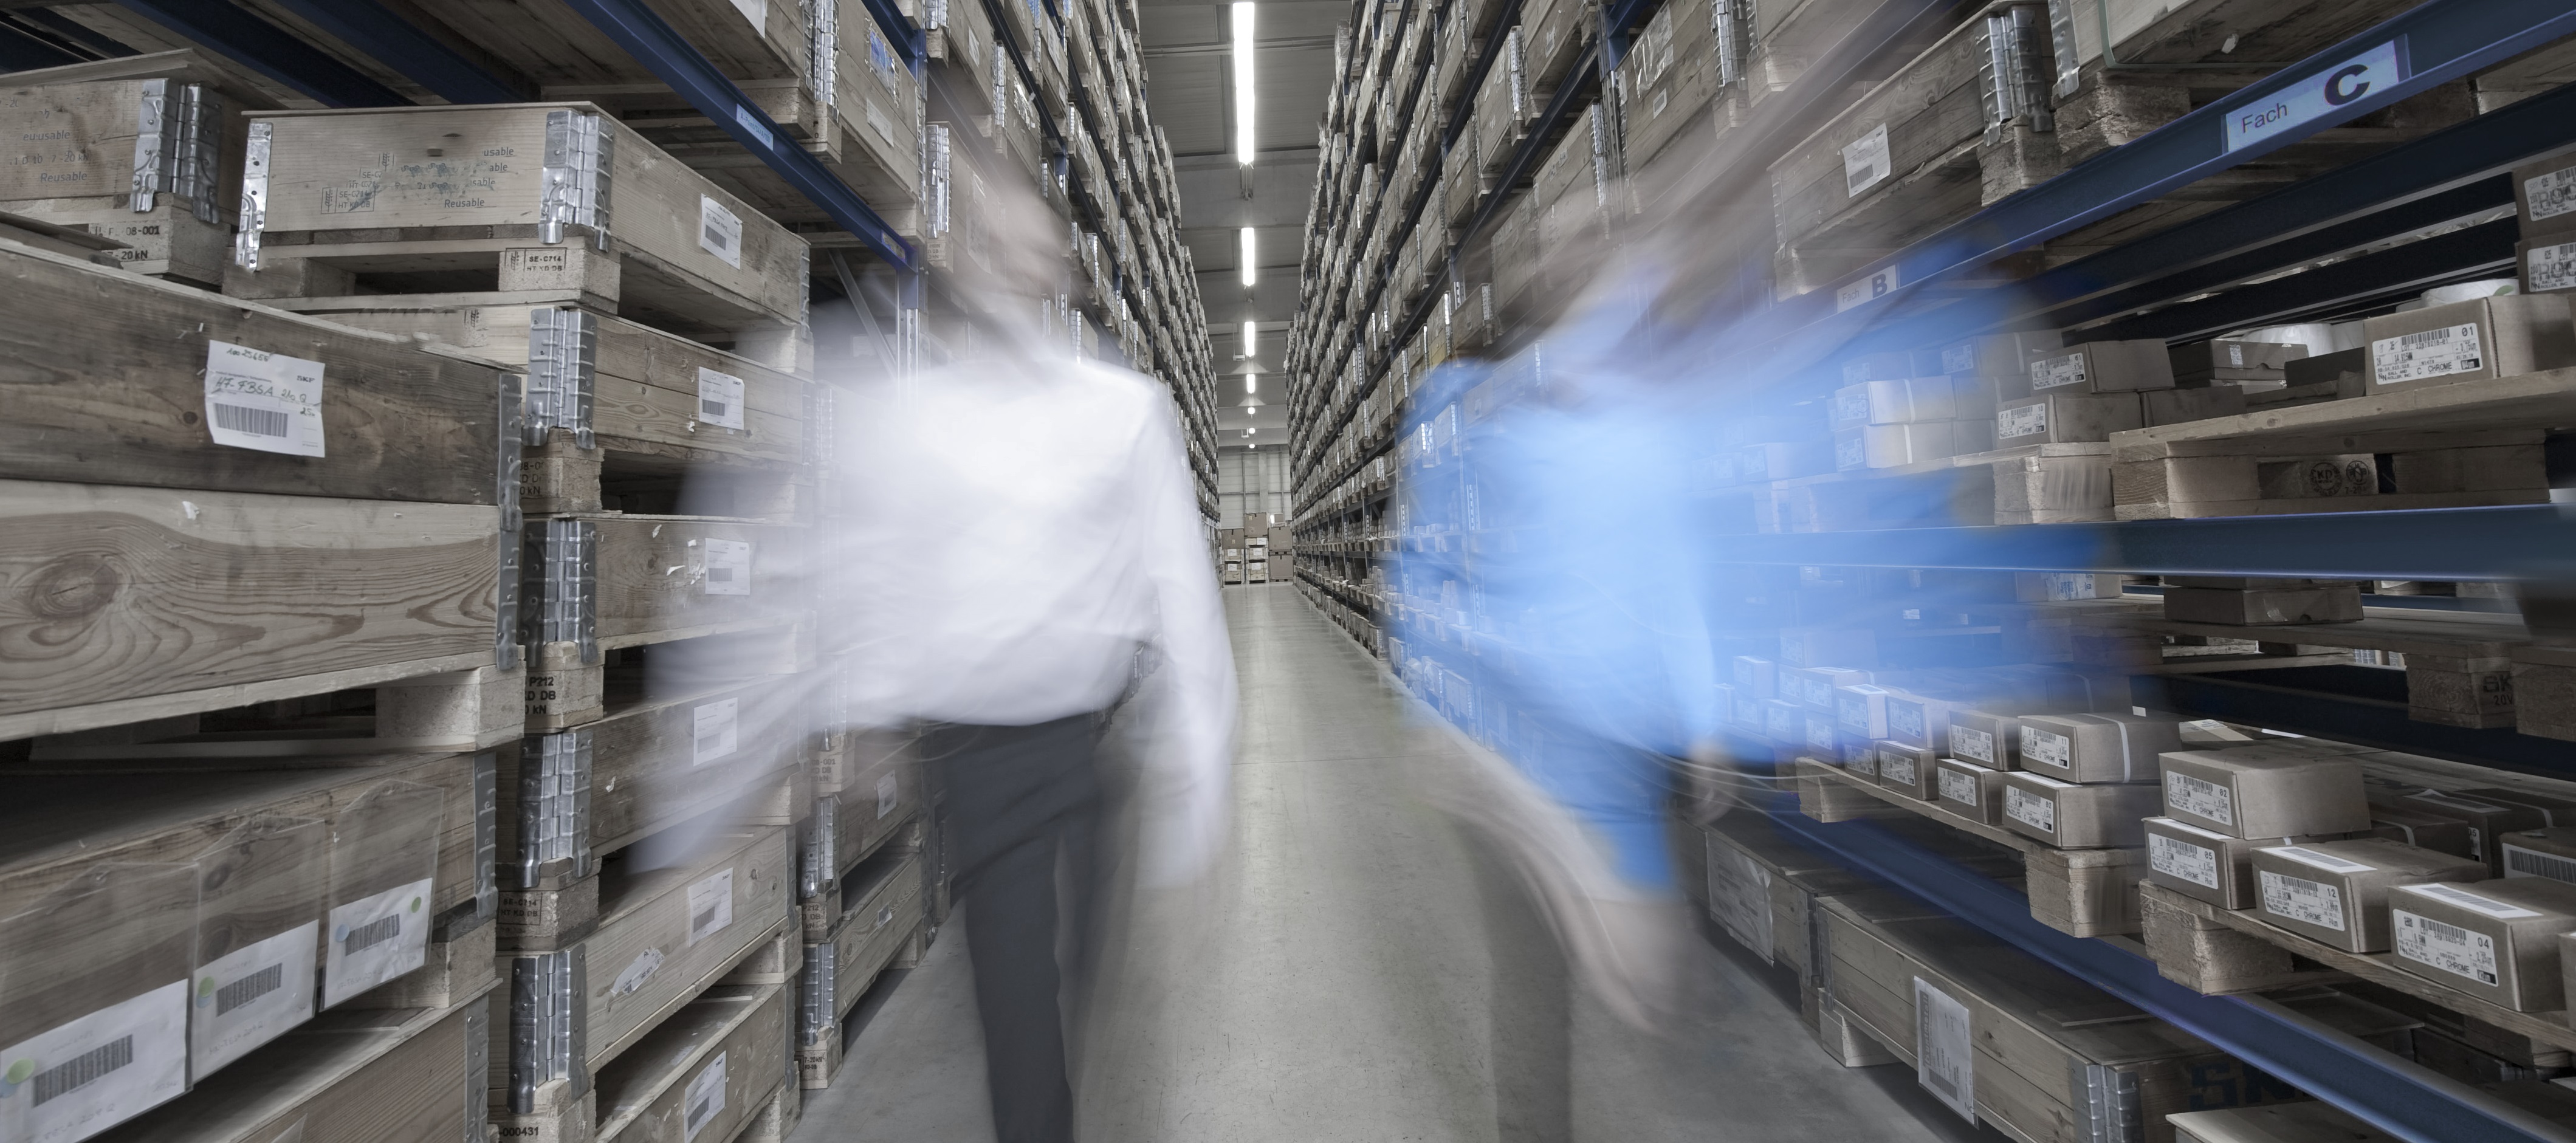 Mit Supply Chain orientiertem Beschaffungsmanagement zum optimierten Beschaffungsprozess